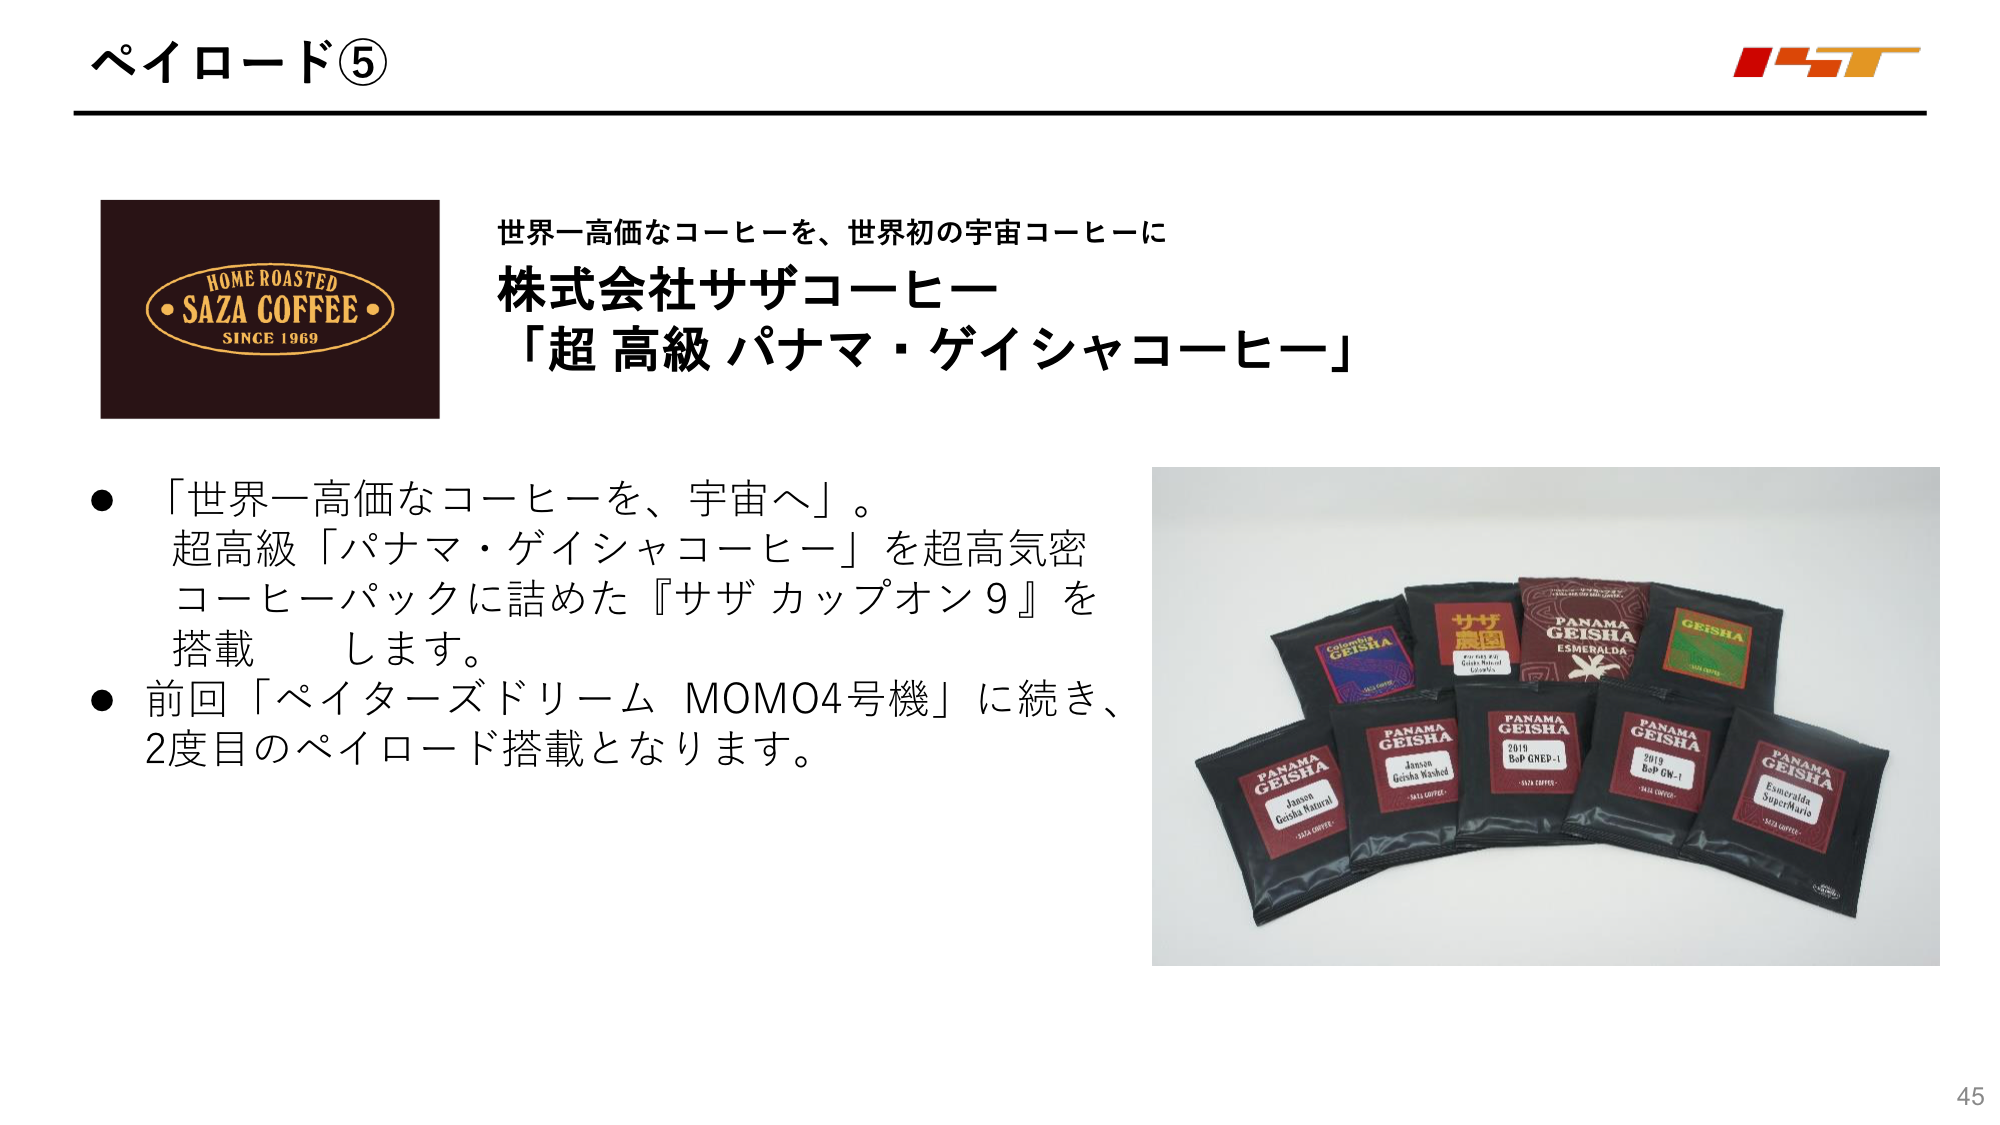 f:id:Imamura:20200603233203p:plain